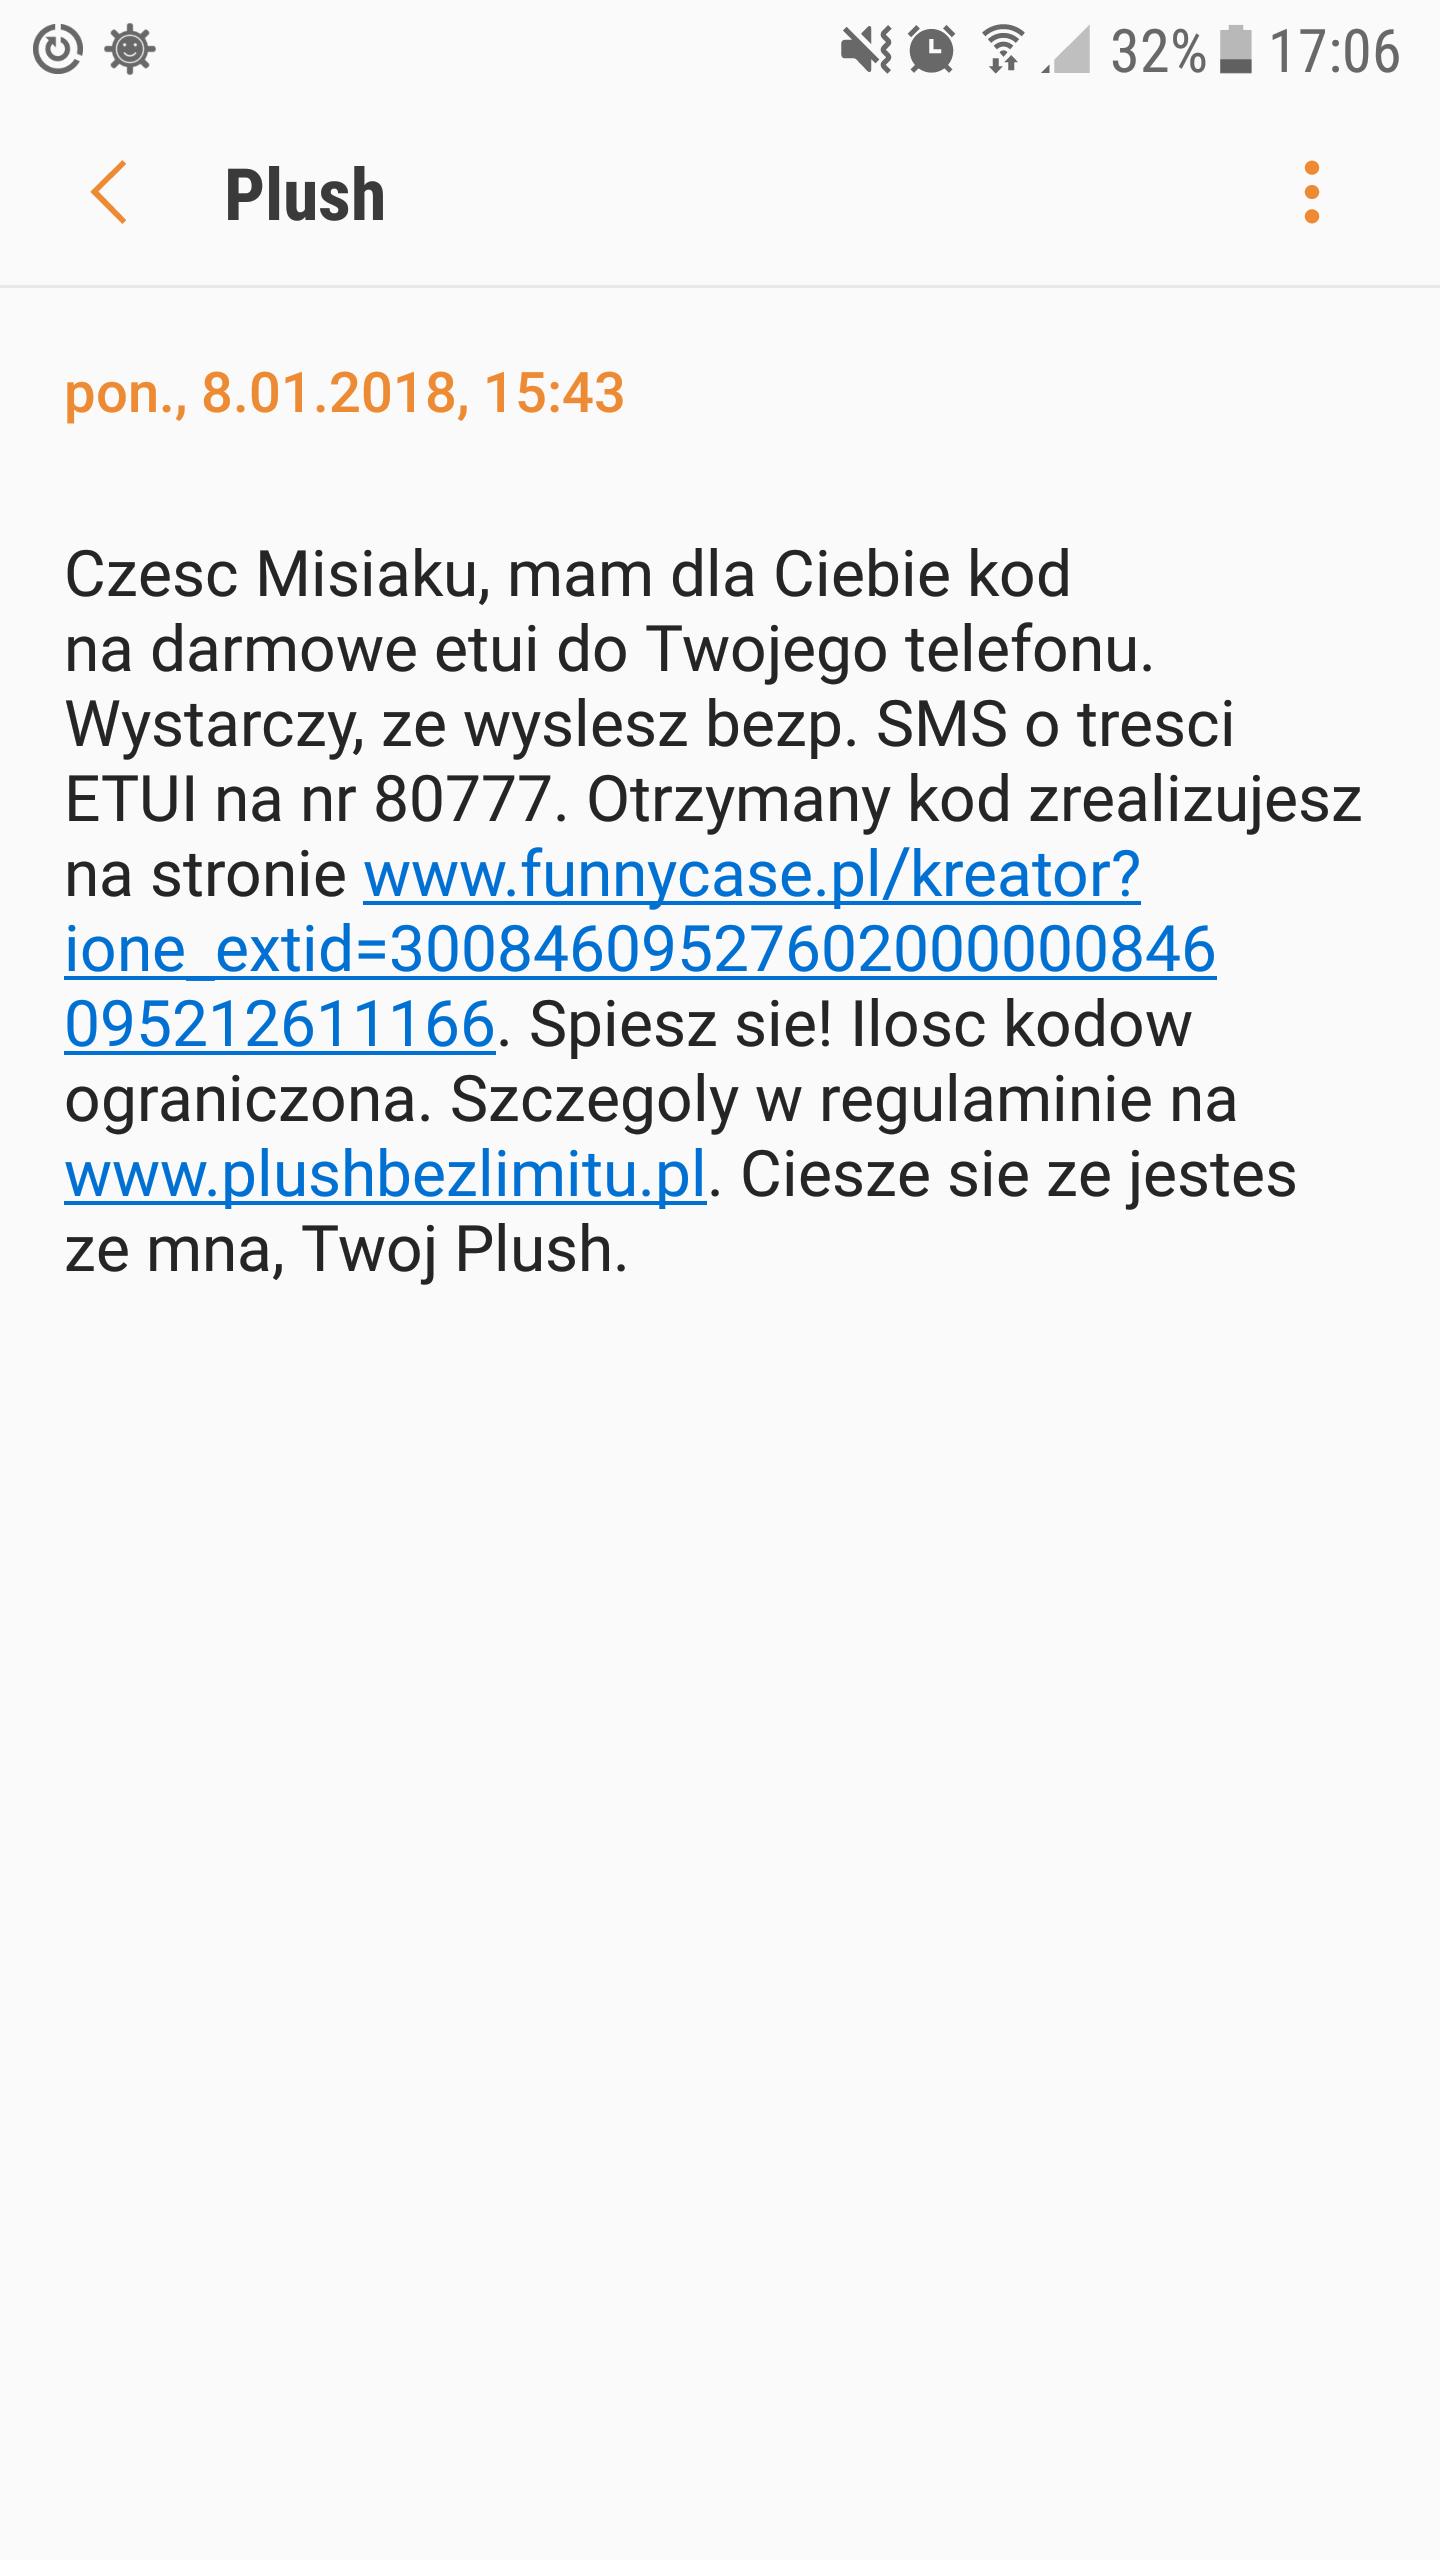 DARMOWE SPERSONALIZOWANE ETUI NA TELEFON @ PLUSH